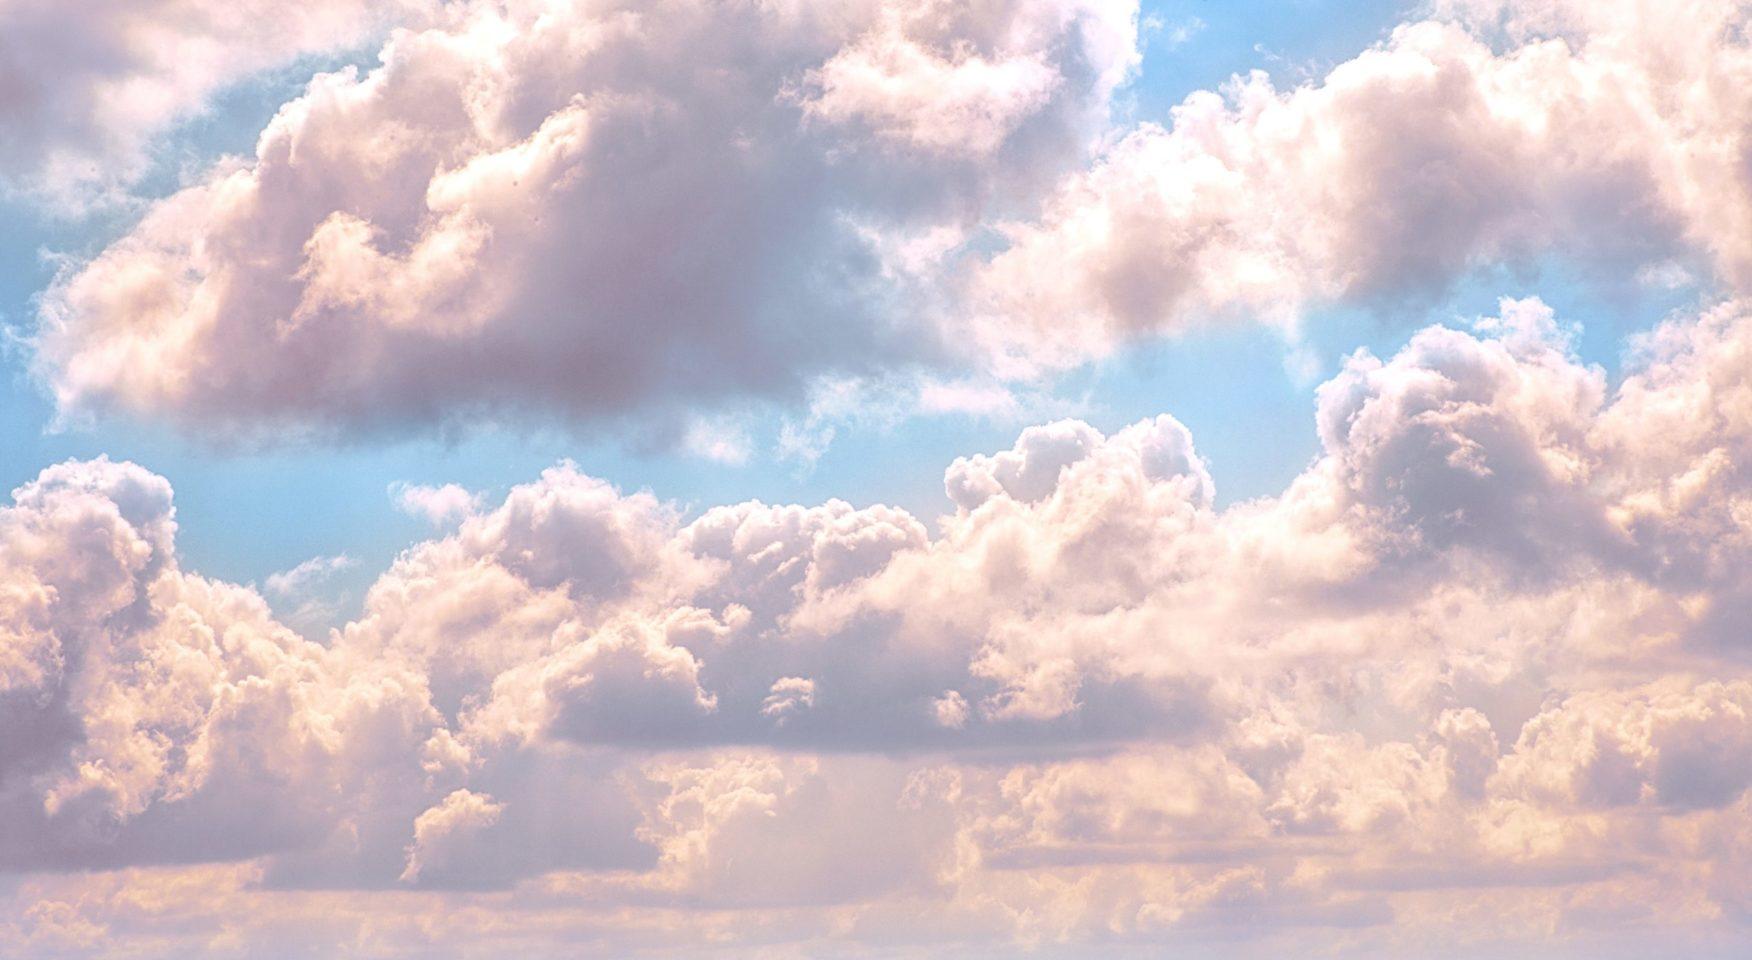 Luminous clouds set against a sunny sky